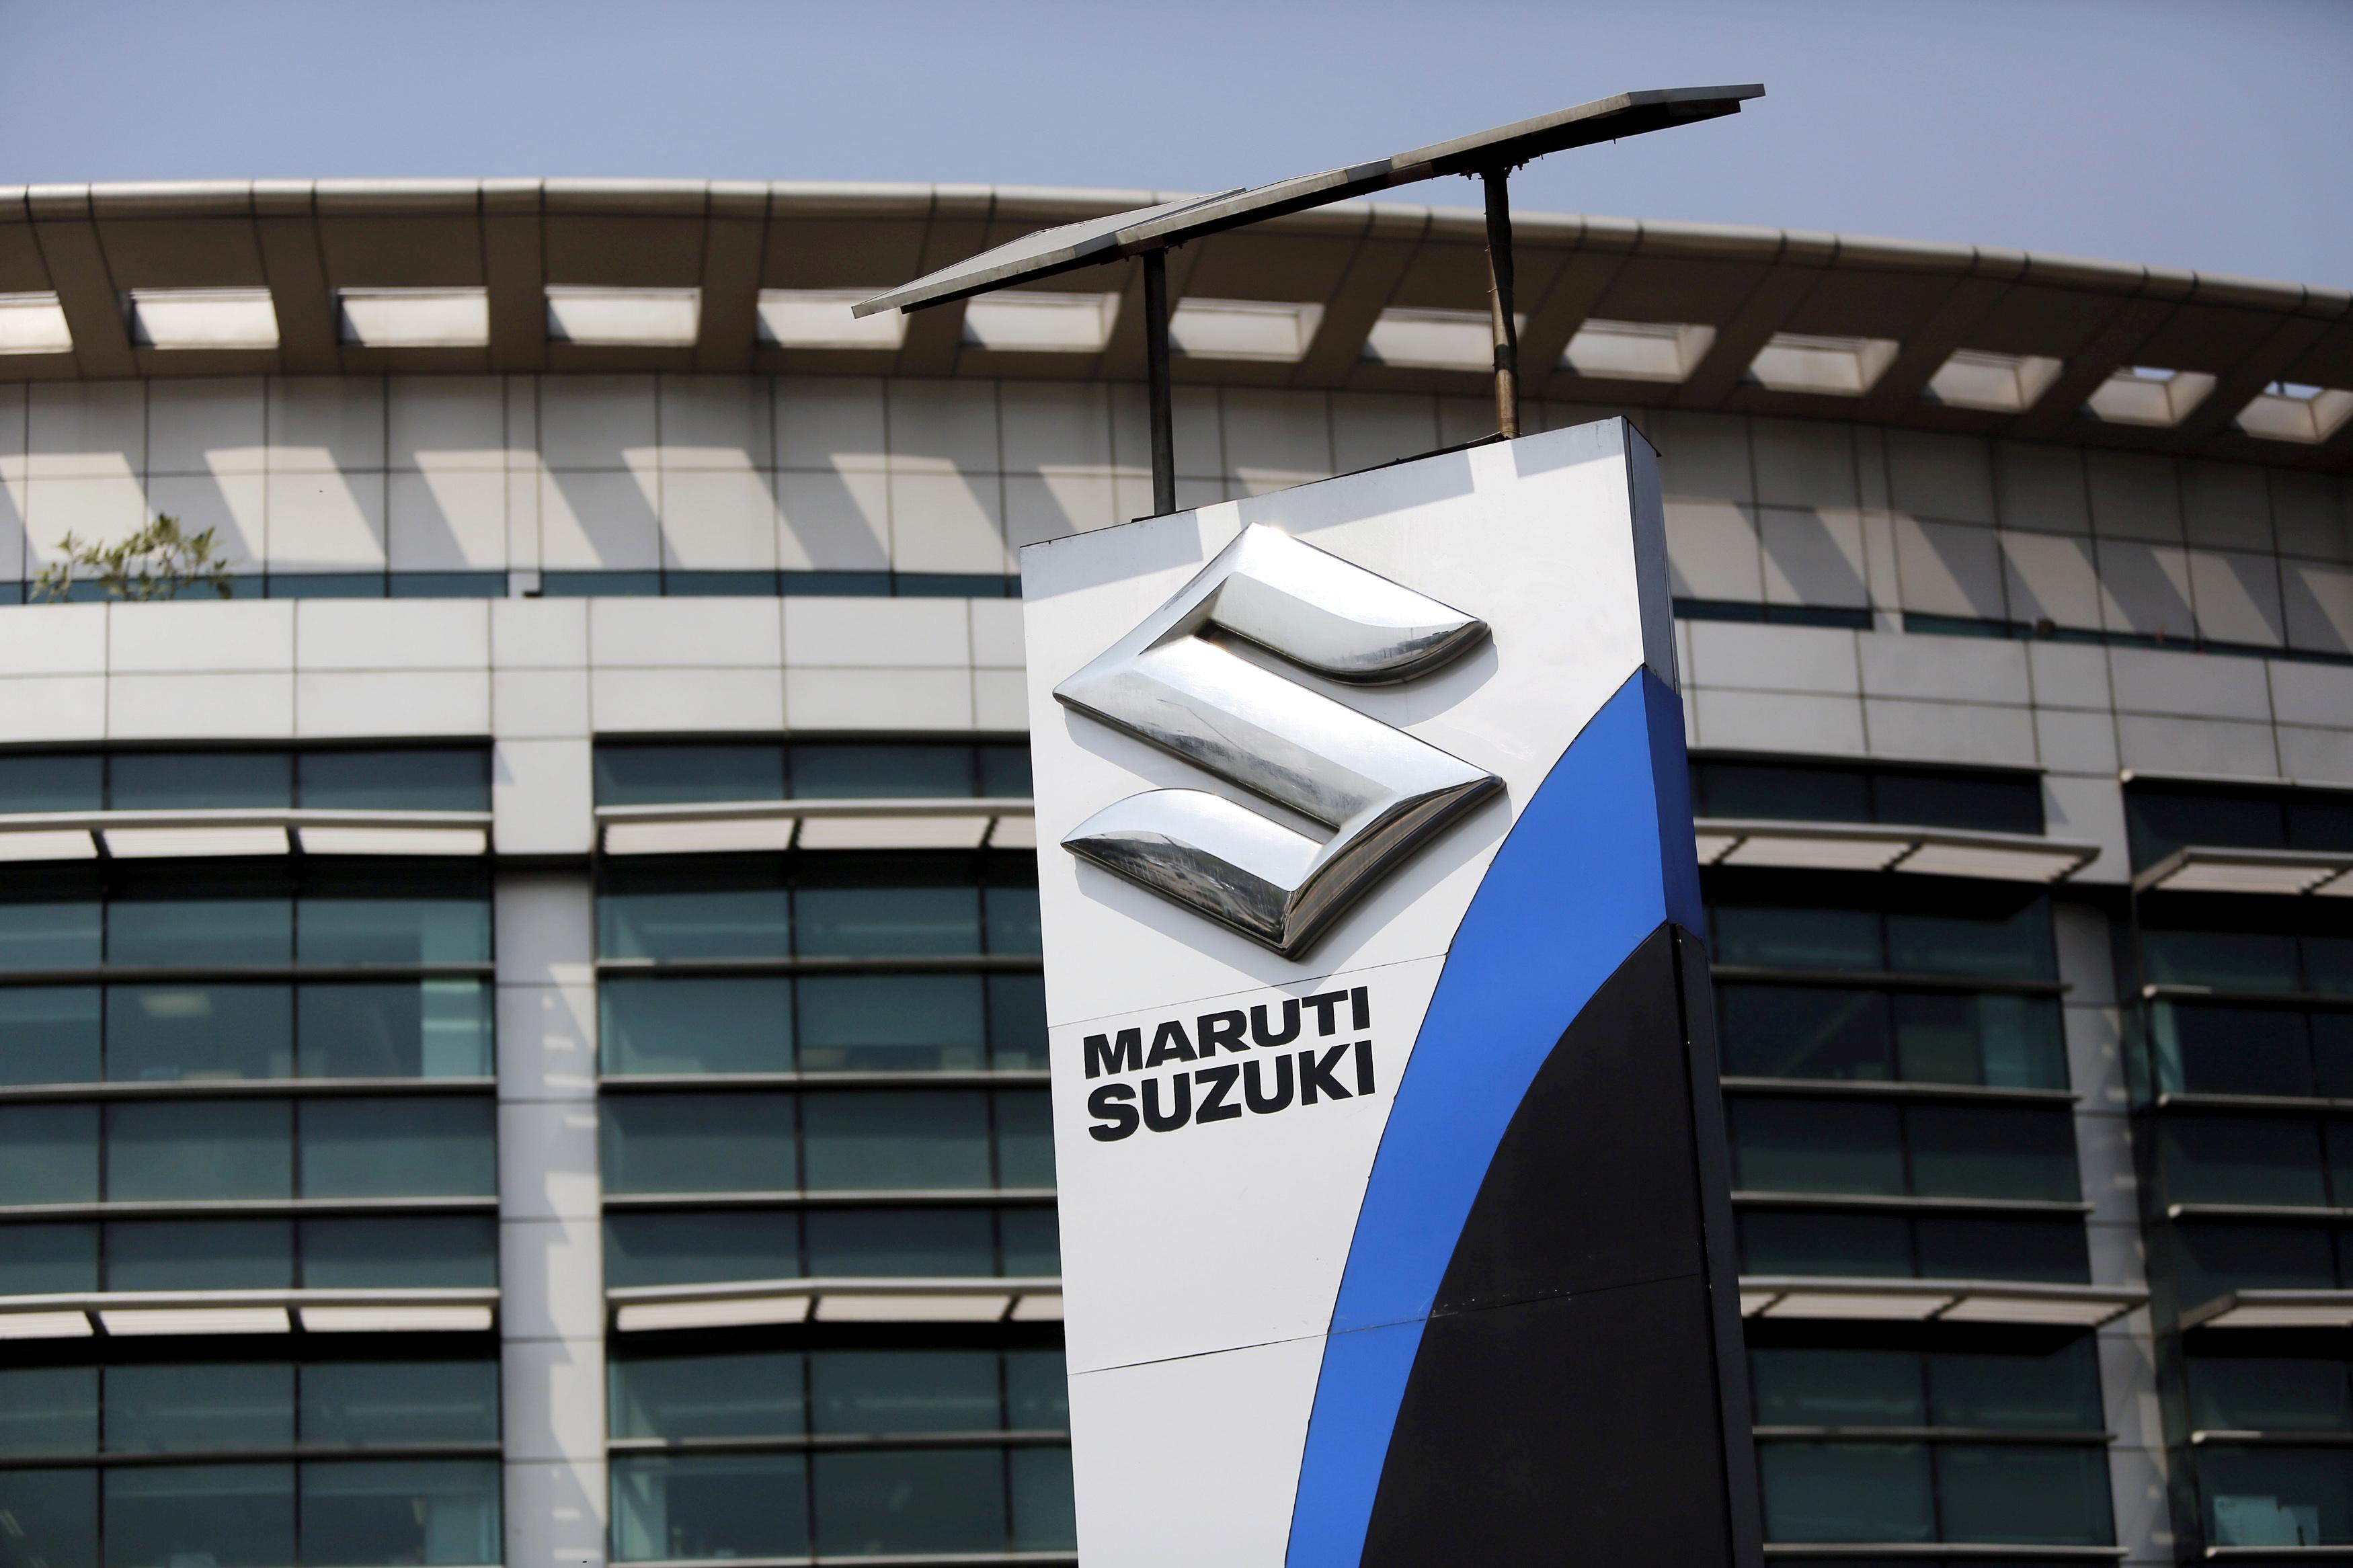 Corporate office of Maruti Suzuki India Limited is pictured in New Delhi, India, February 26, 2016. REUTERS/Anindito Mukherjee